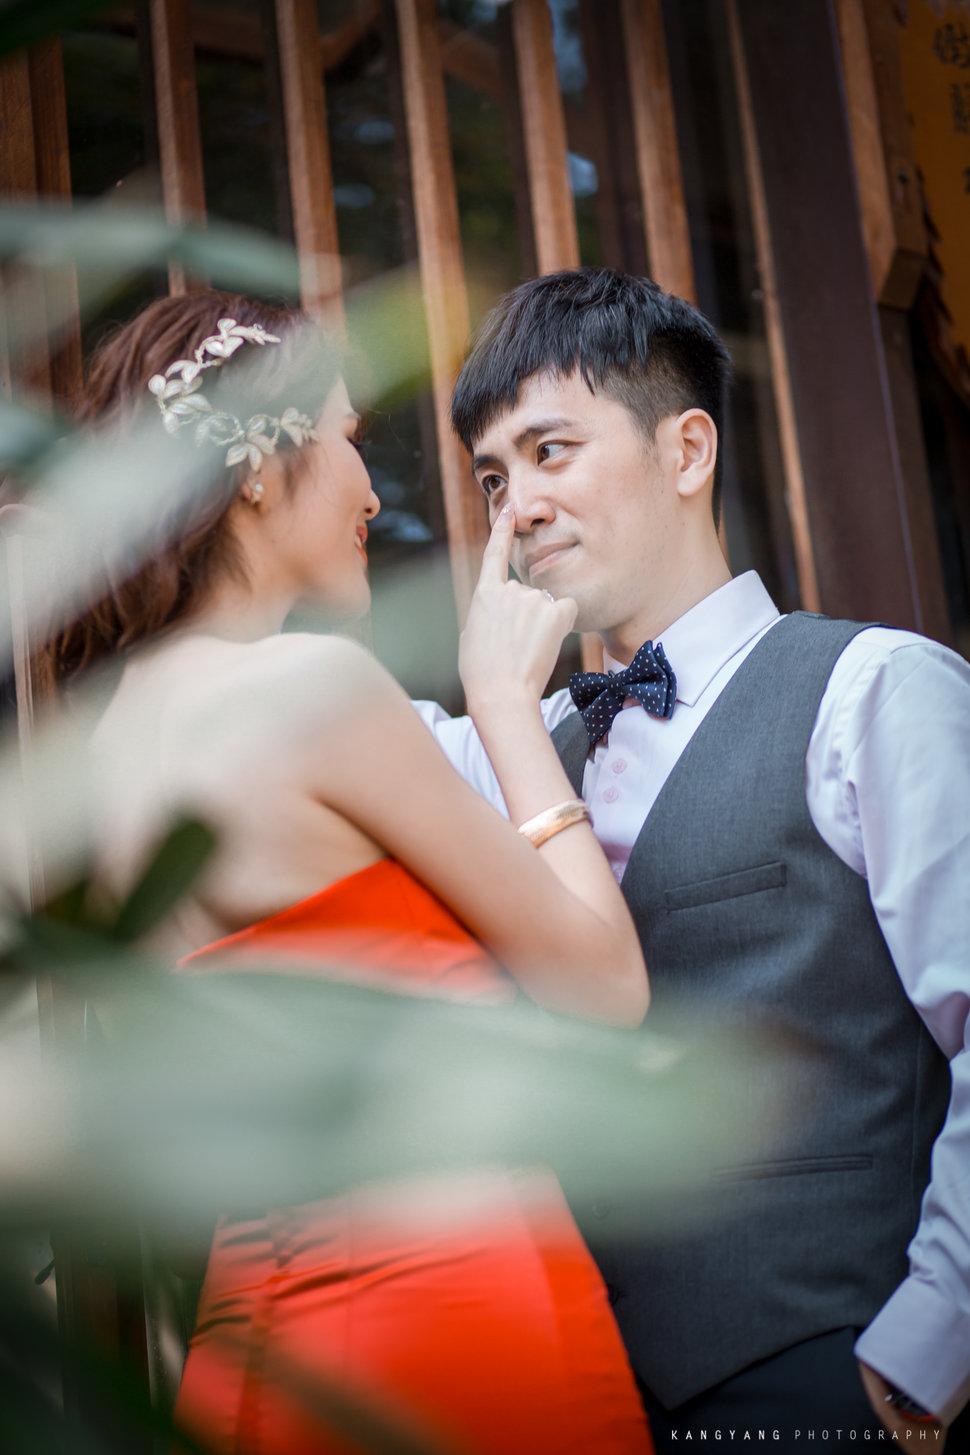 U&M 戶外證婚教堂婚禮@台北青青食尚花園/費加洛教堂(編號:307185) - 婚攝楊康影像Kstudio《結婚吧》